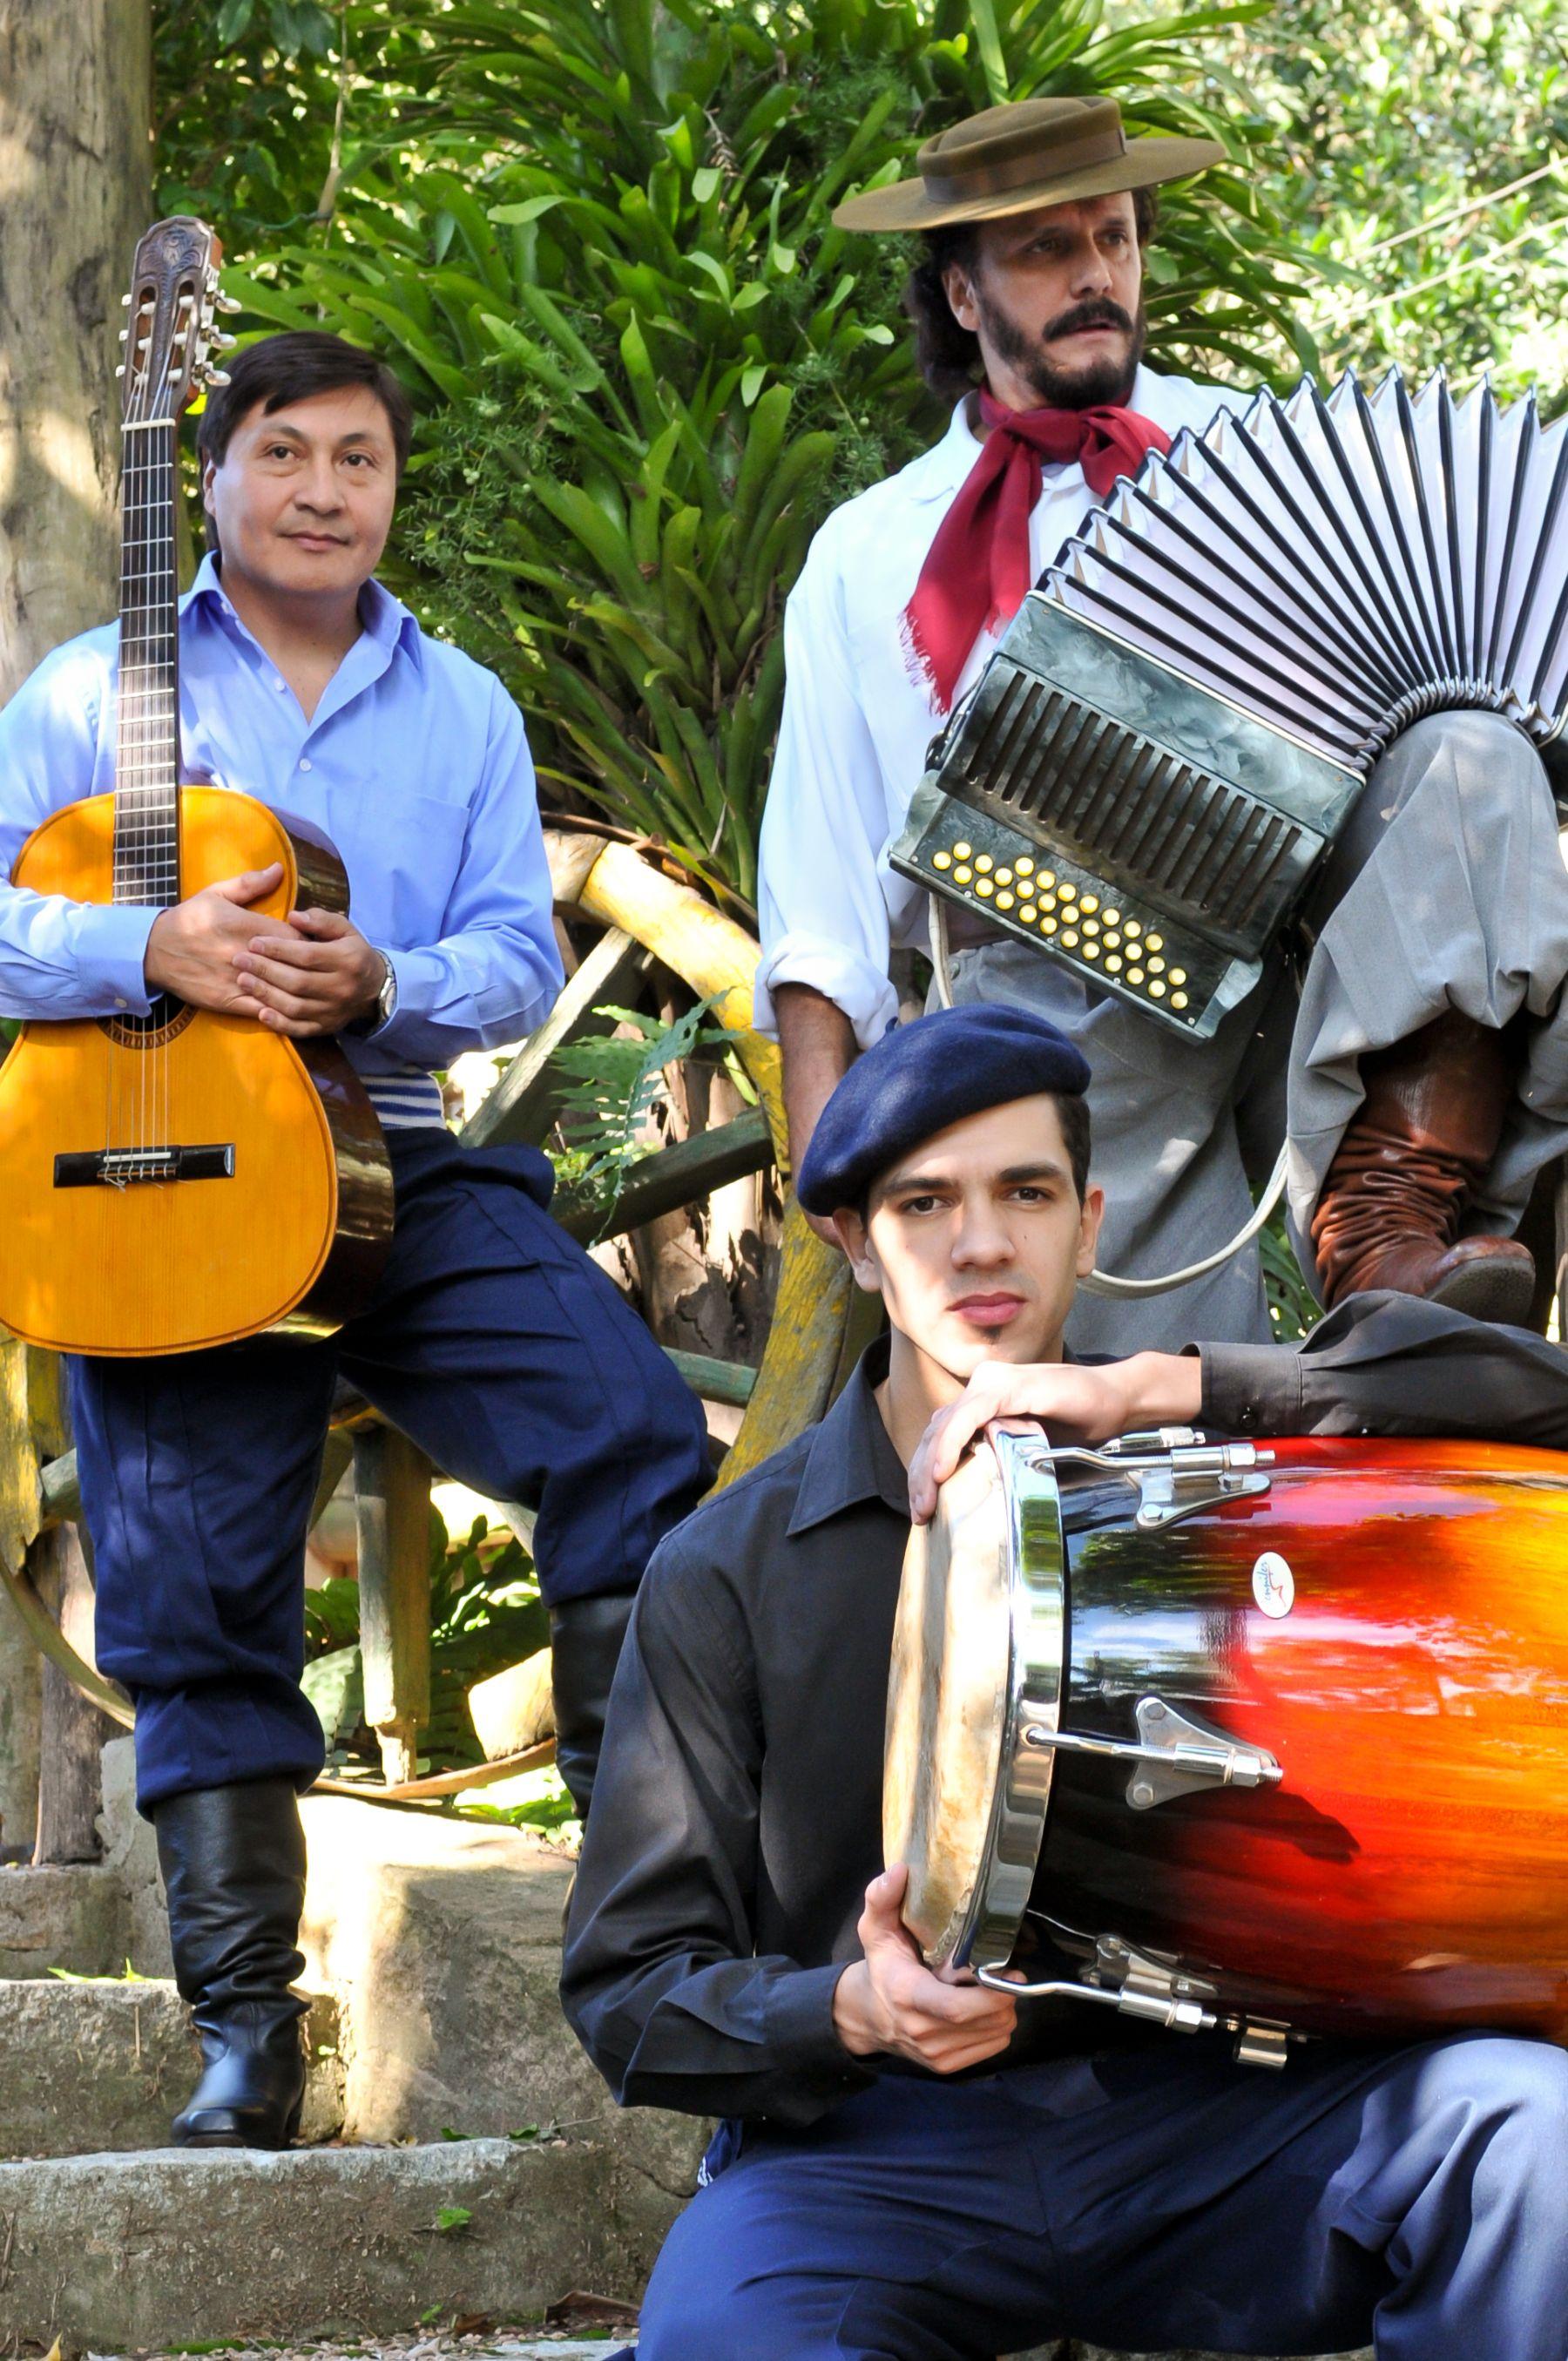 Gilberto Monteiro e grupo